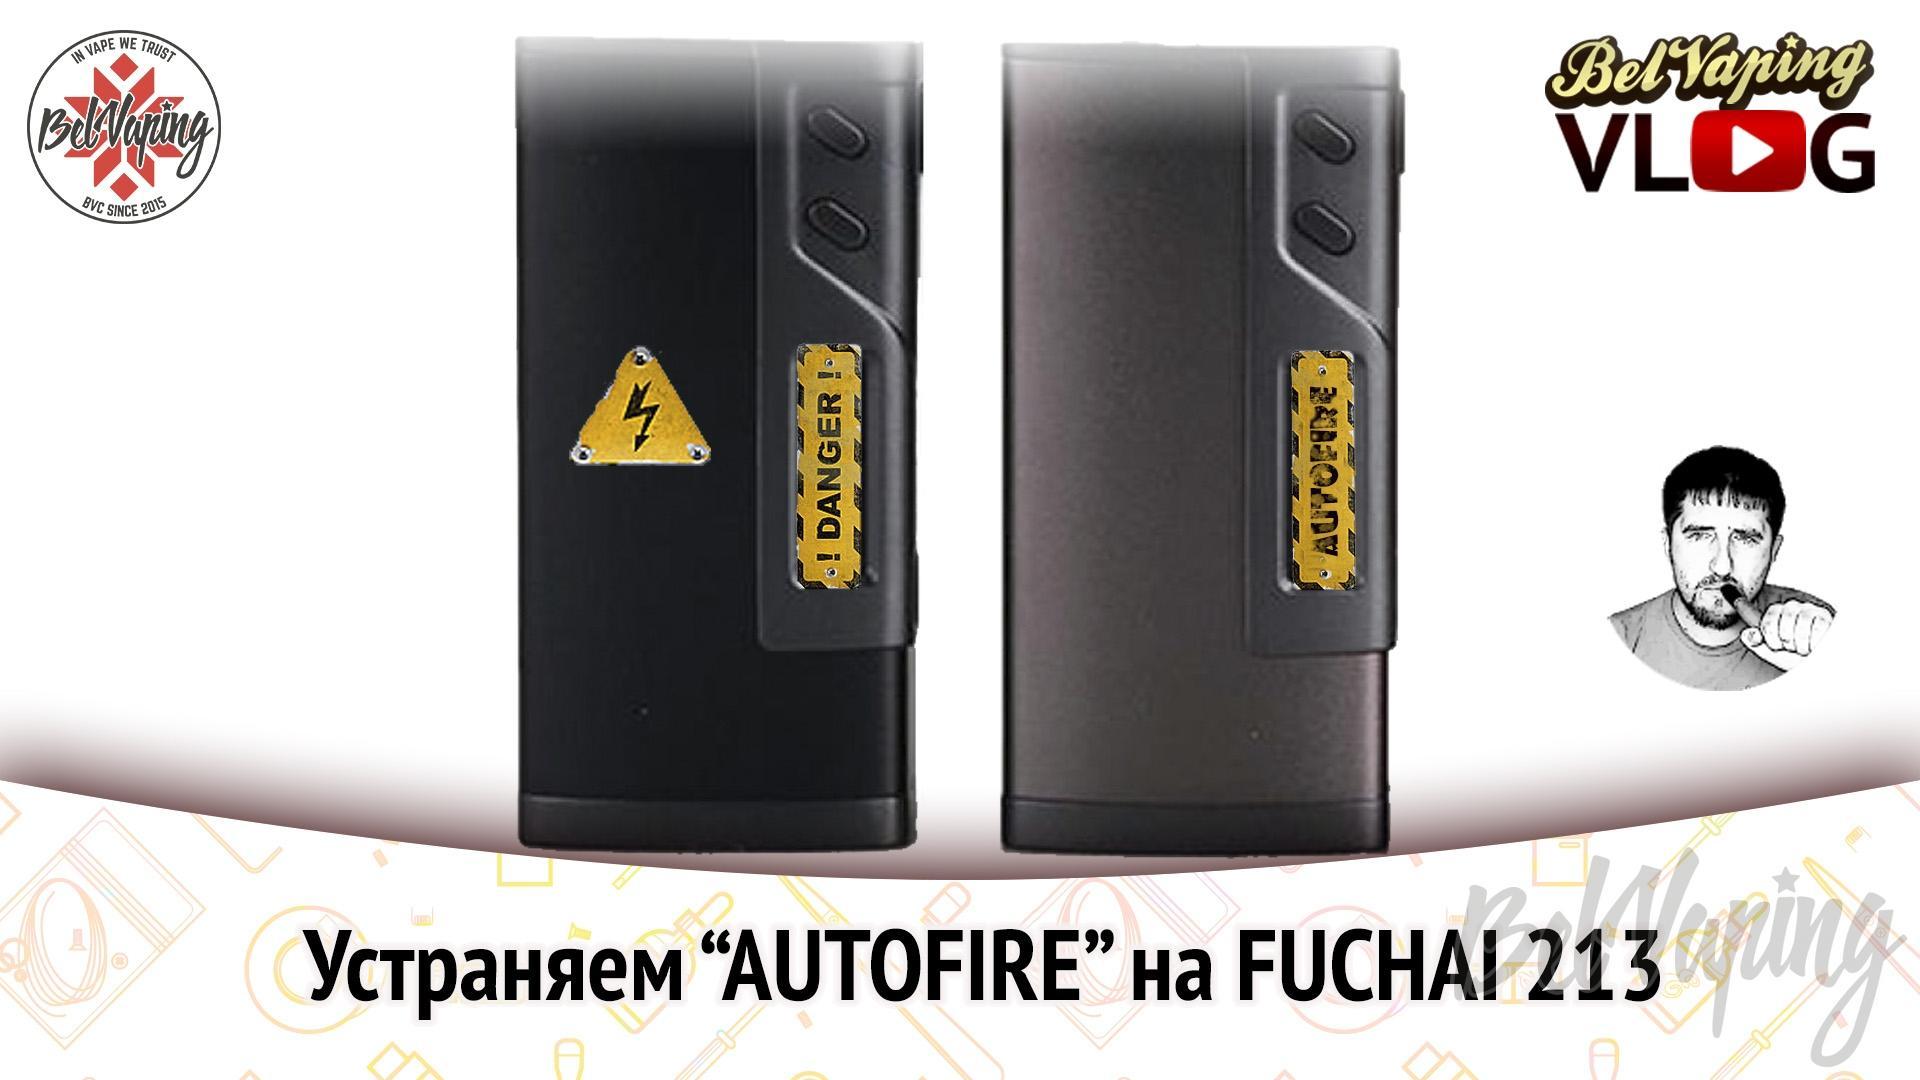 Ремонт Fuchai 213. Устраняем автофаер